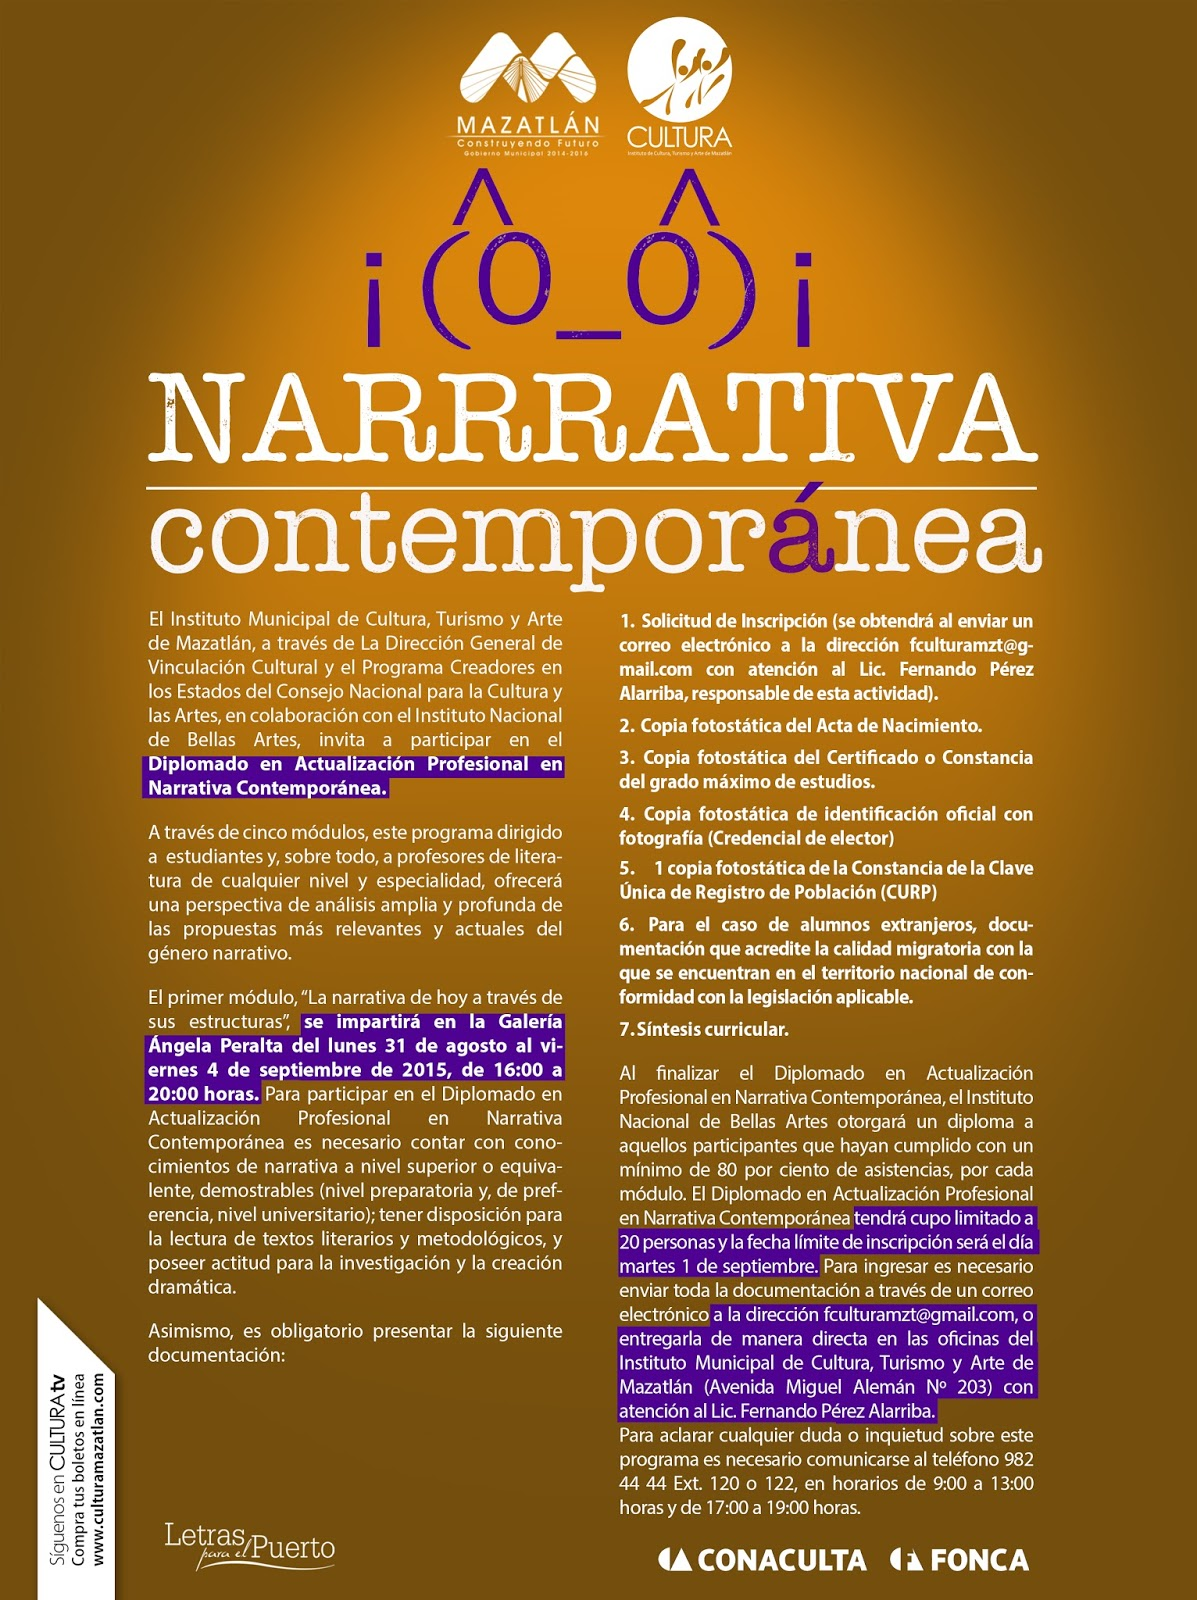 Convocan A Diplomado De Narrativa Contemporánea Entre Veredas